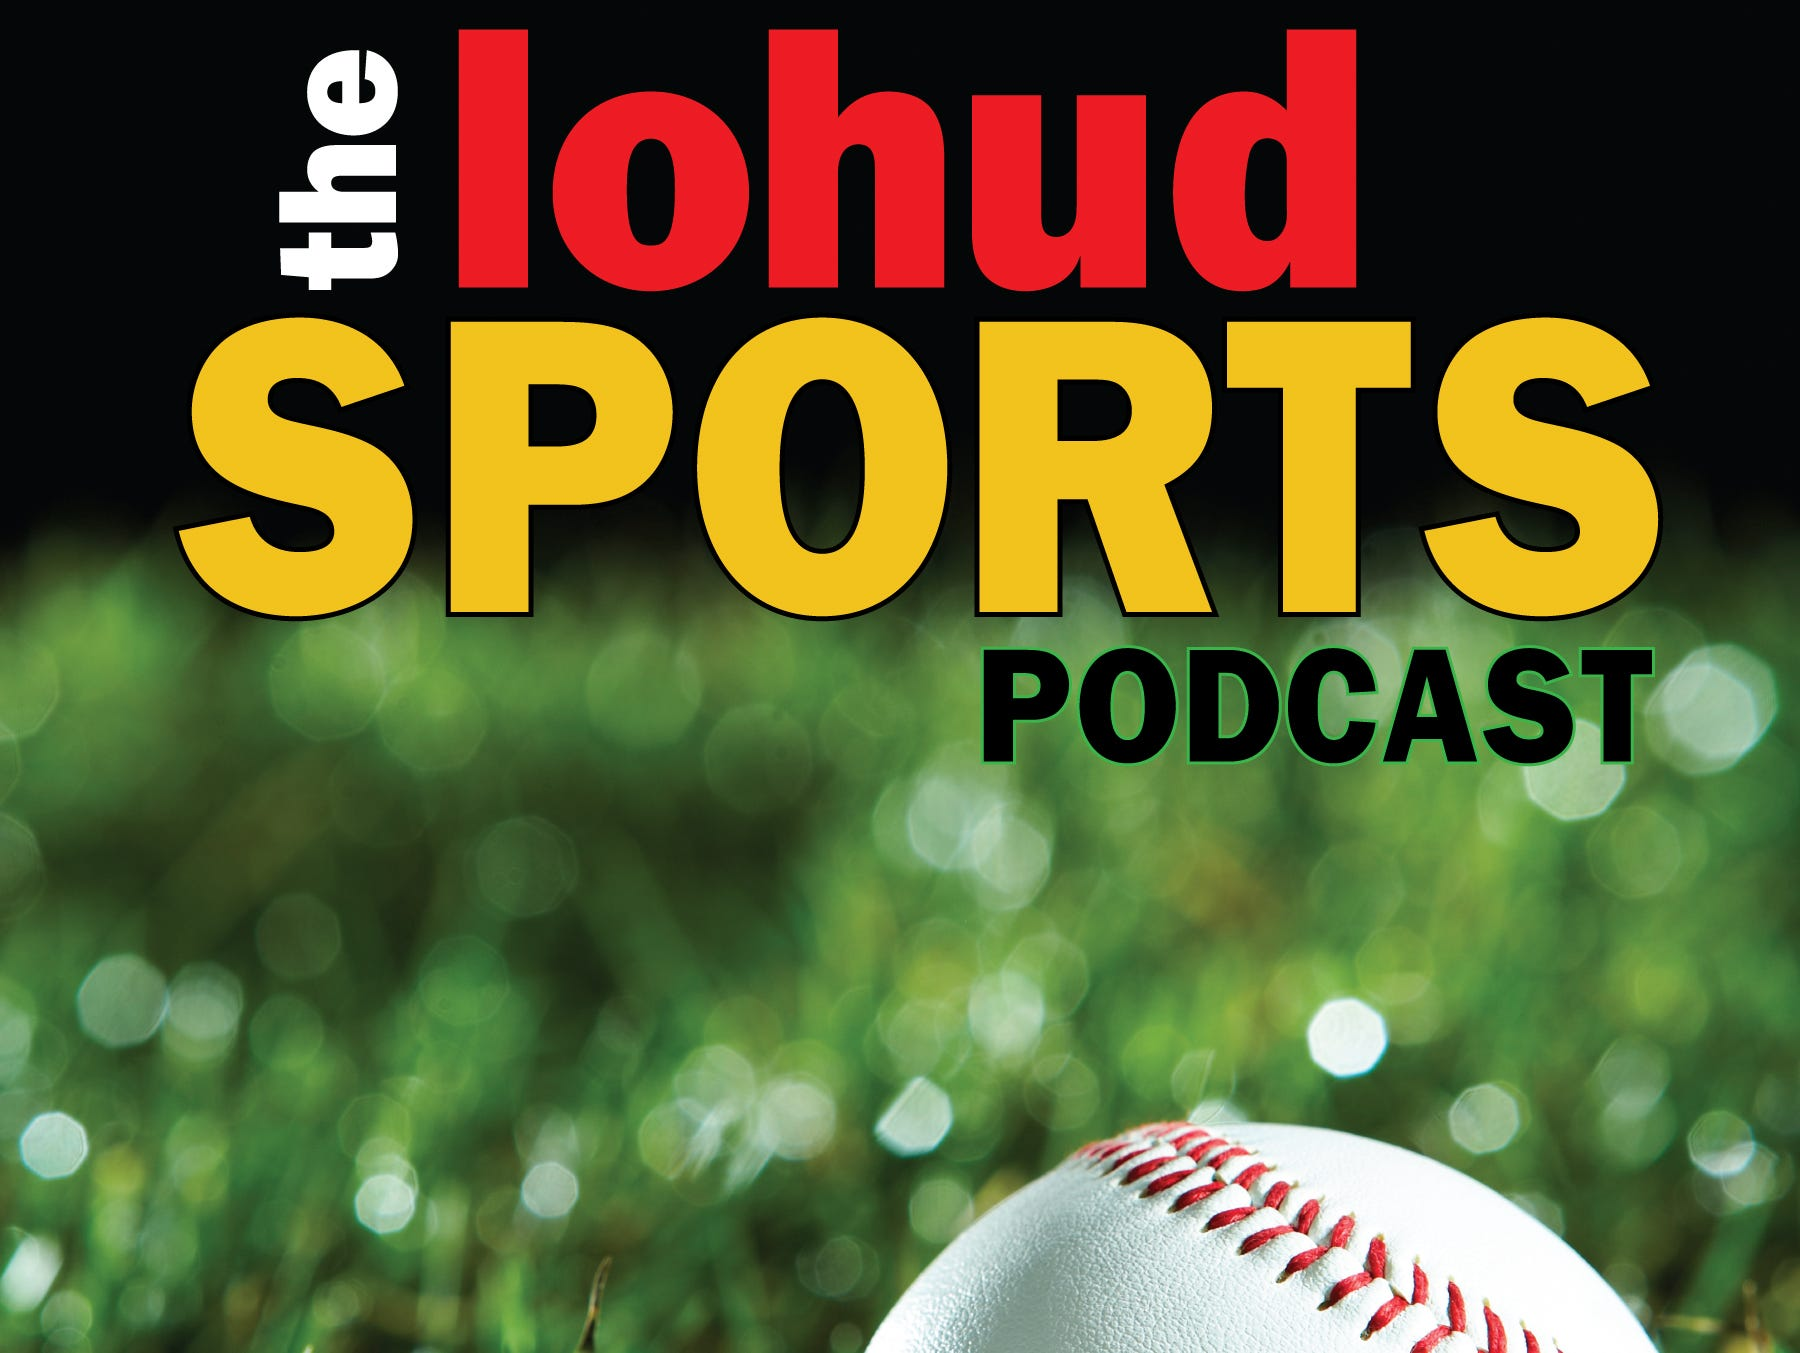 The lohud Sports Podcast.